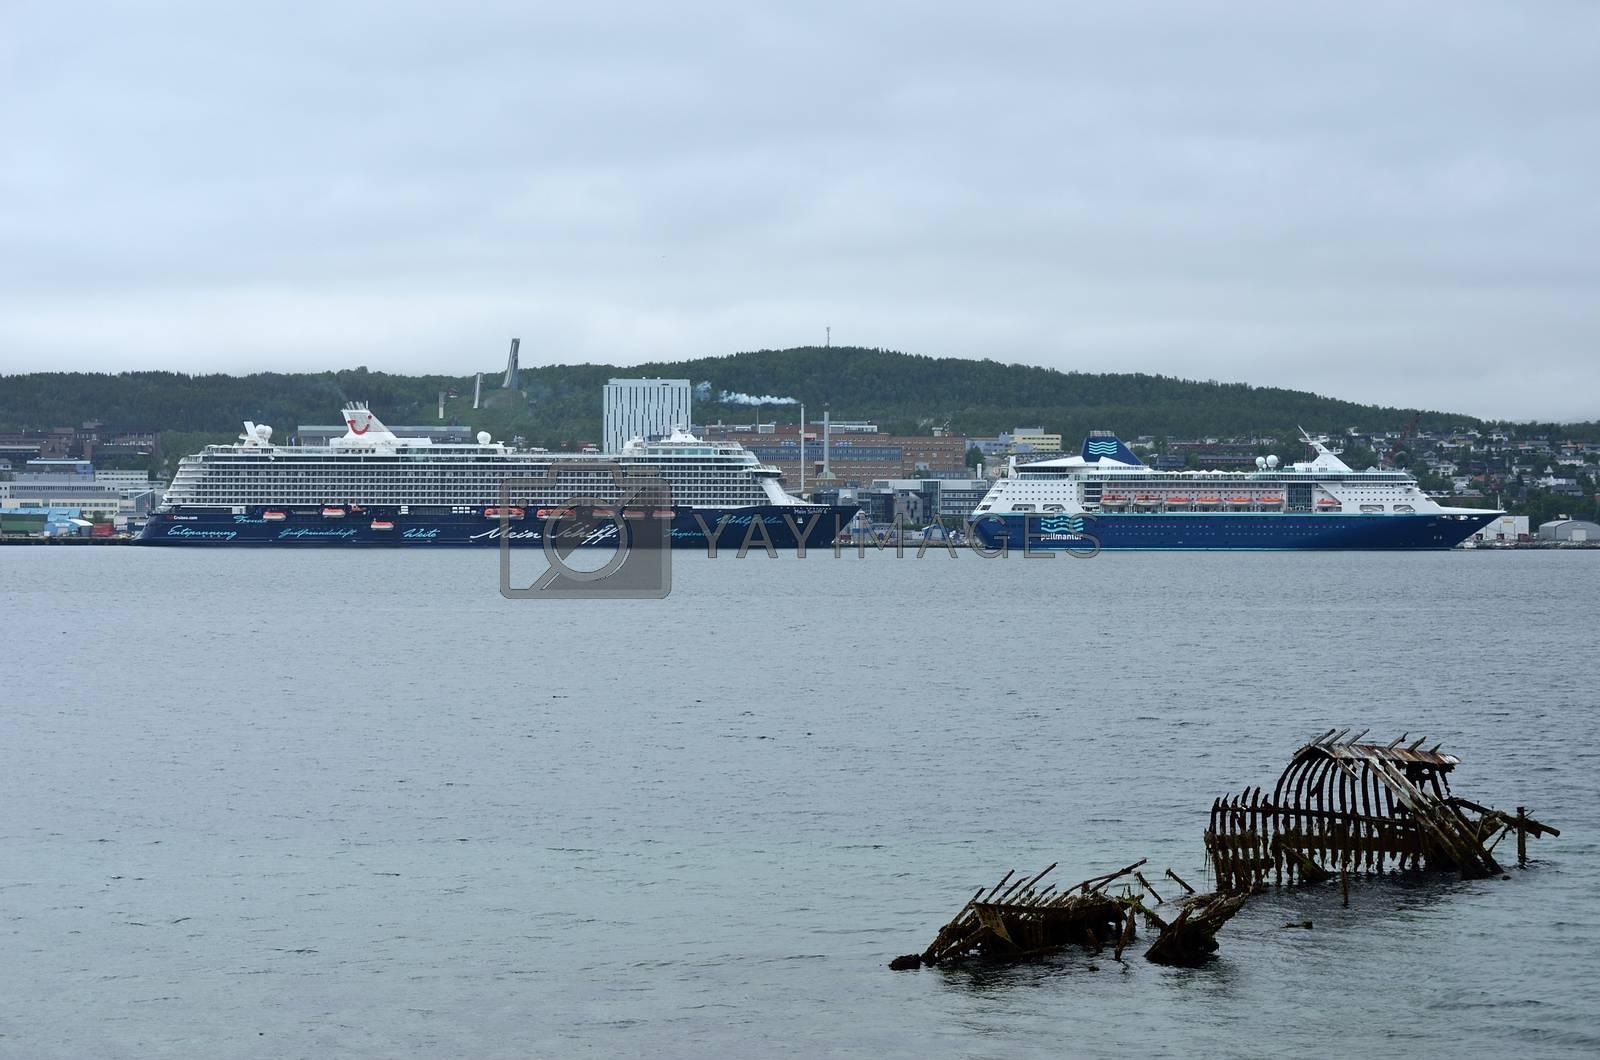 cruise ships tromsoe city harbour, june 2015